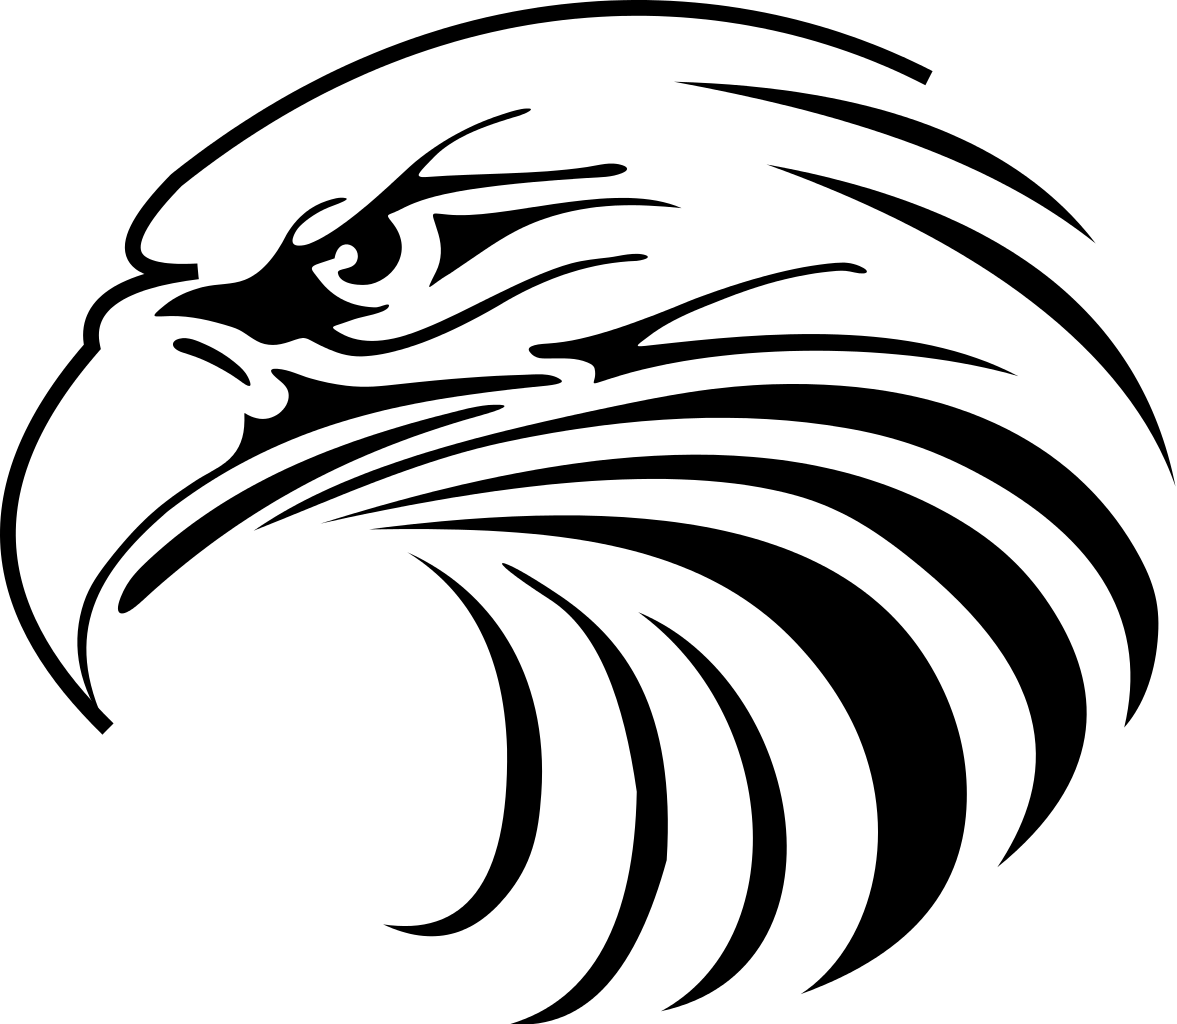 Free Eagle Vector, Download Free Clip Art, Free Clip Art